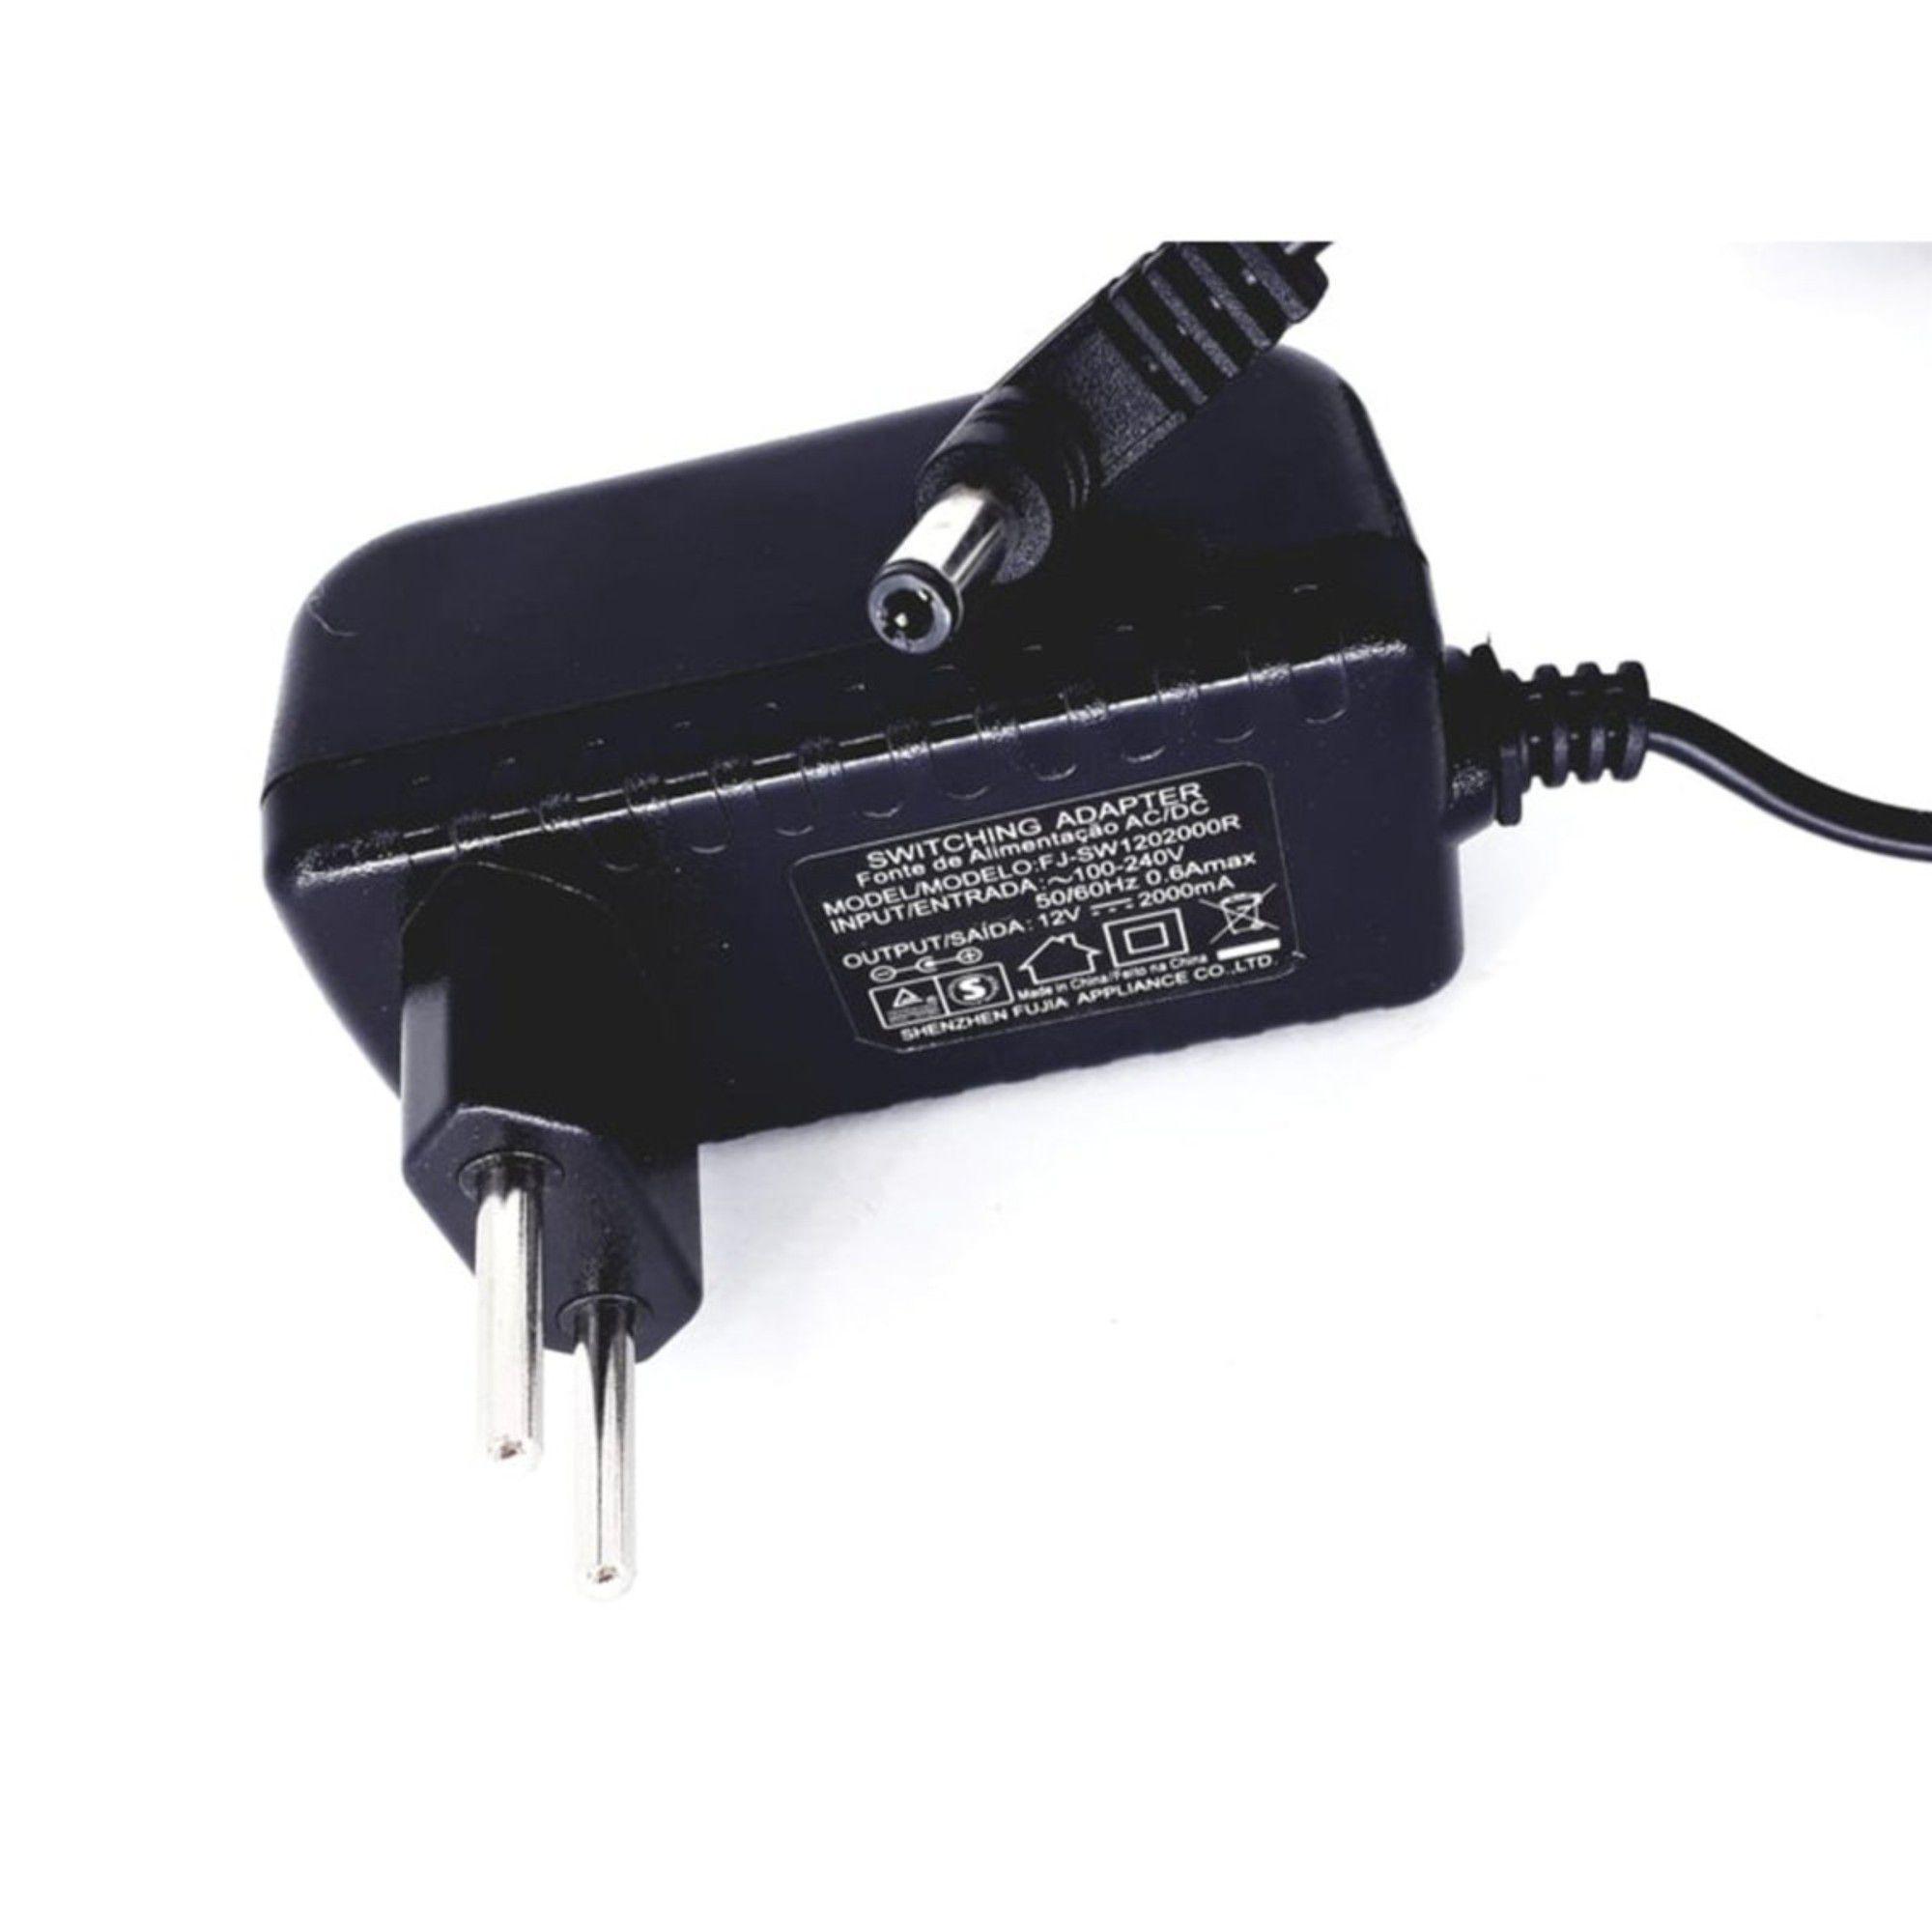 Fonte 5v 2a Conector P4